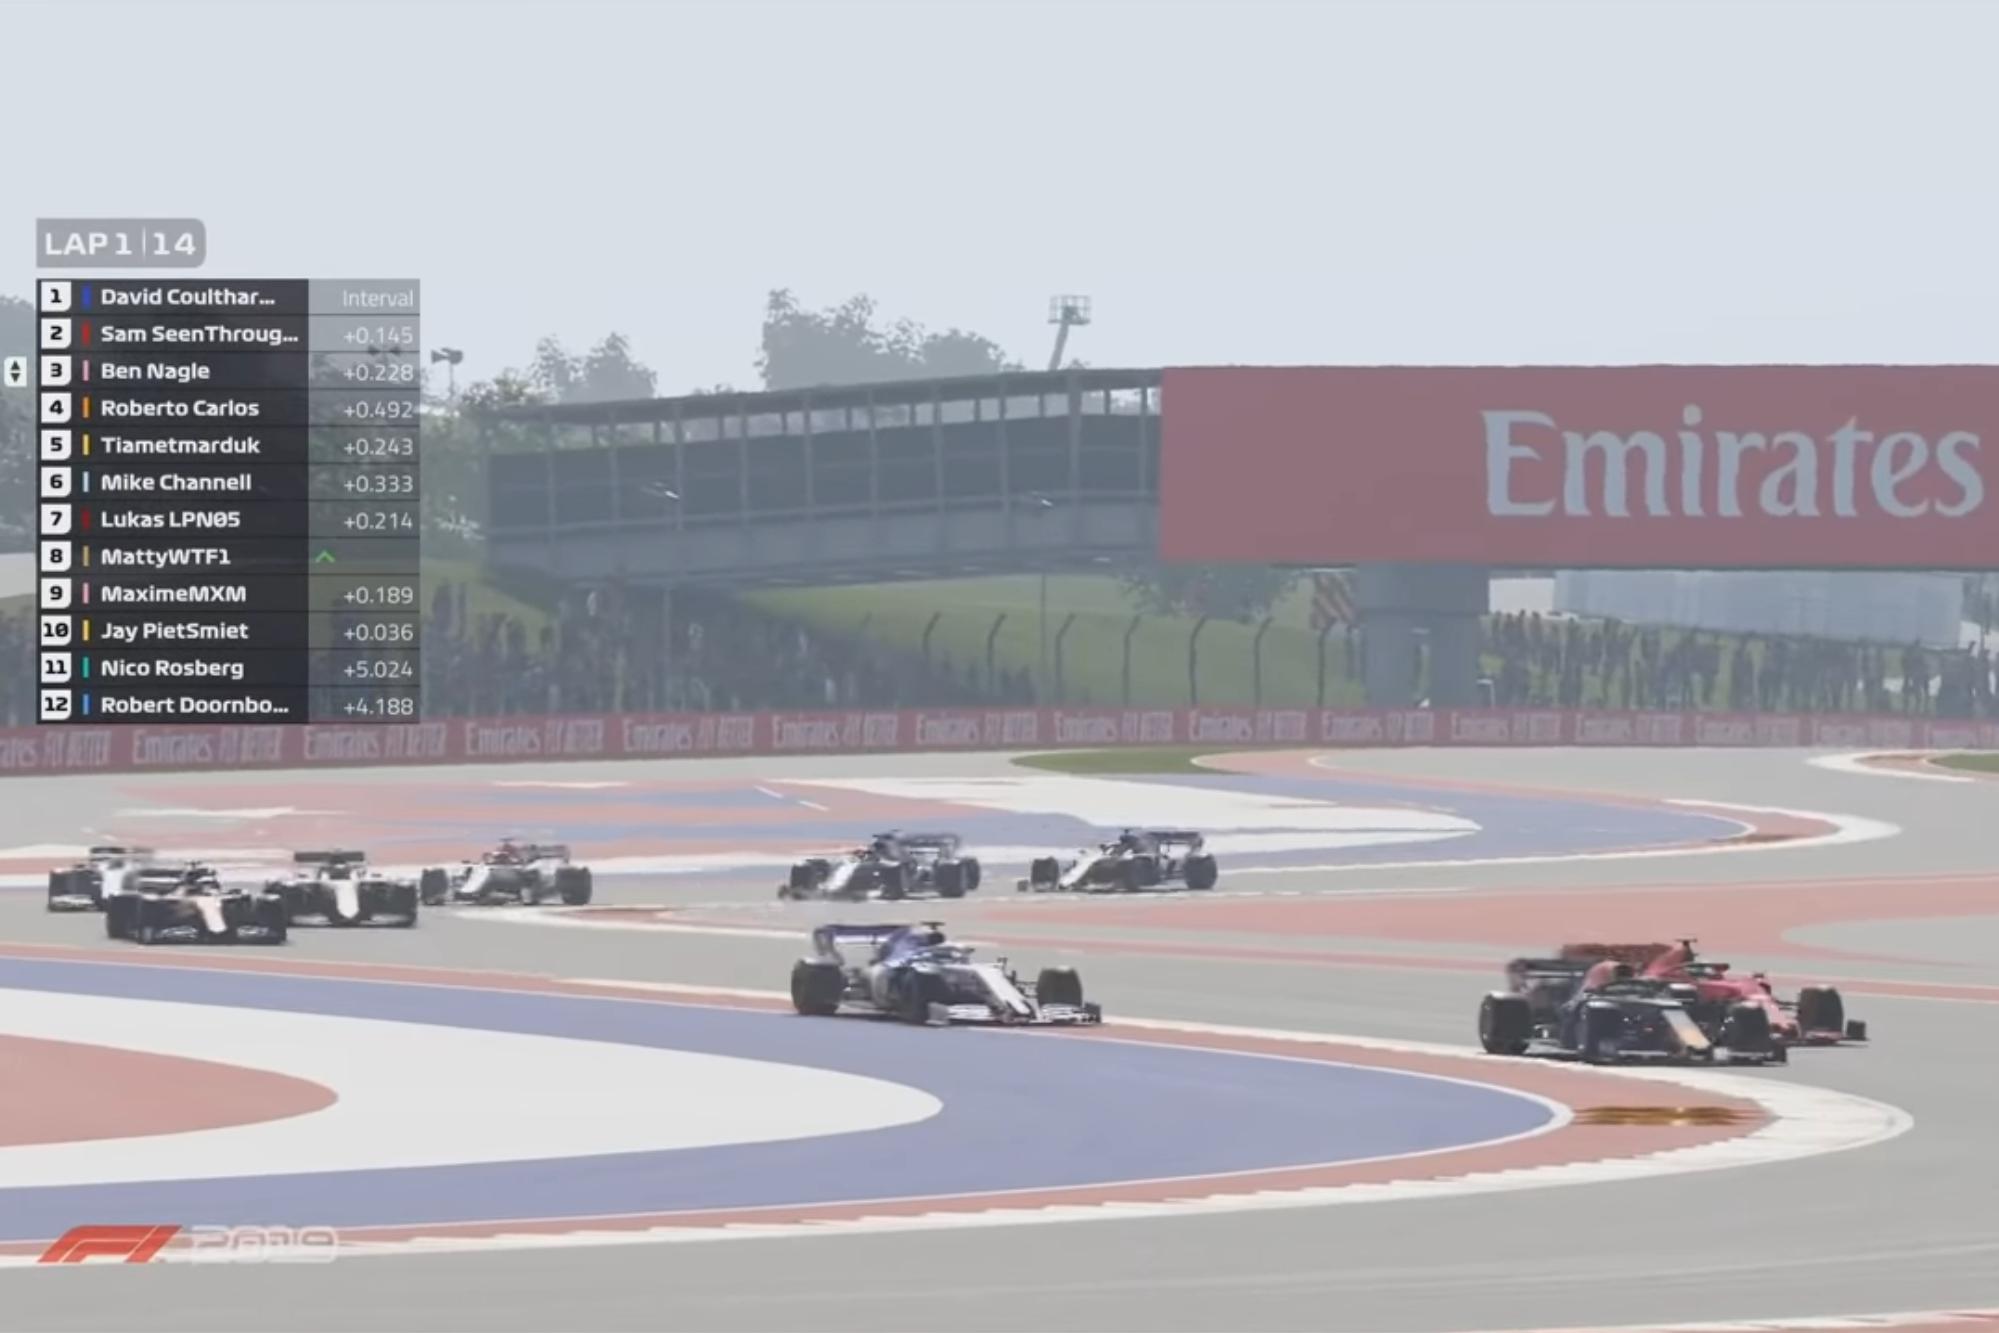 F1 esports challenge